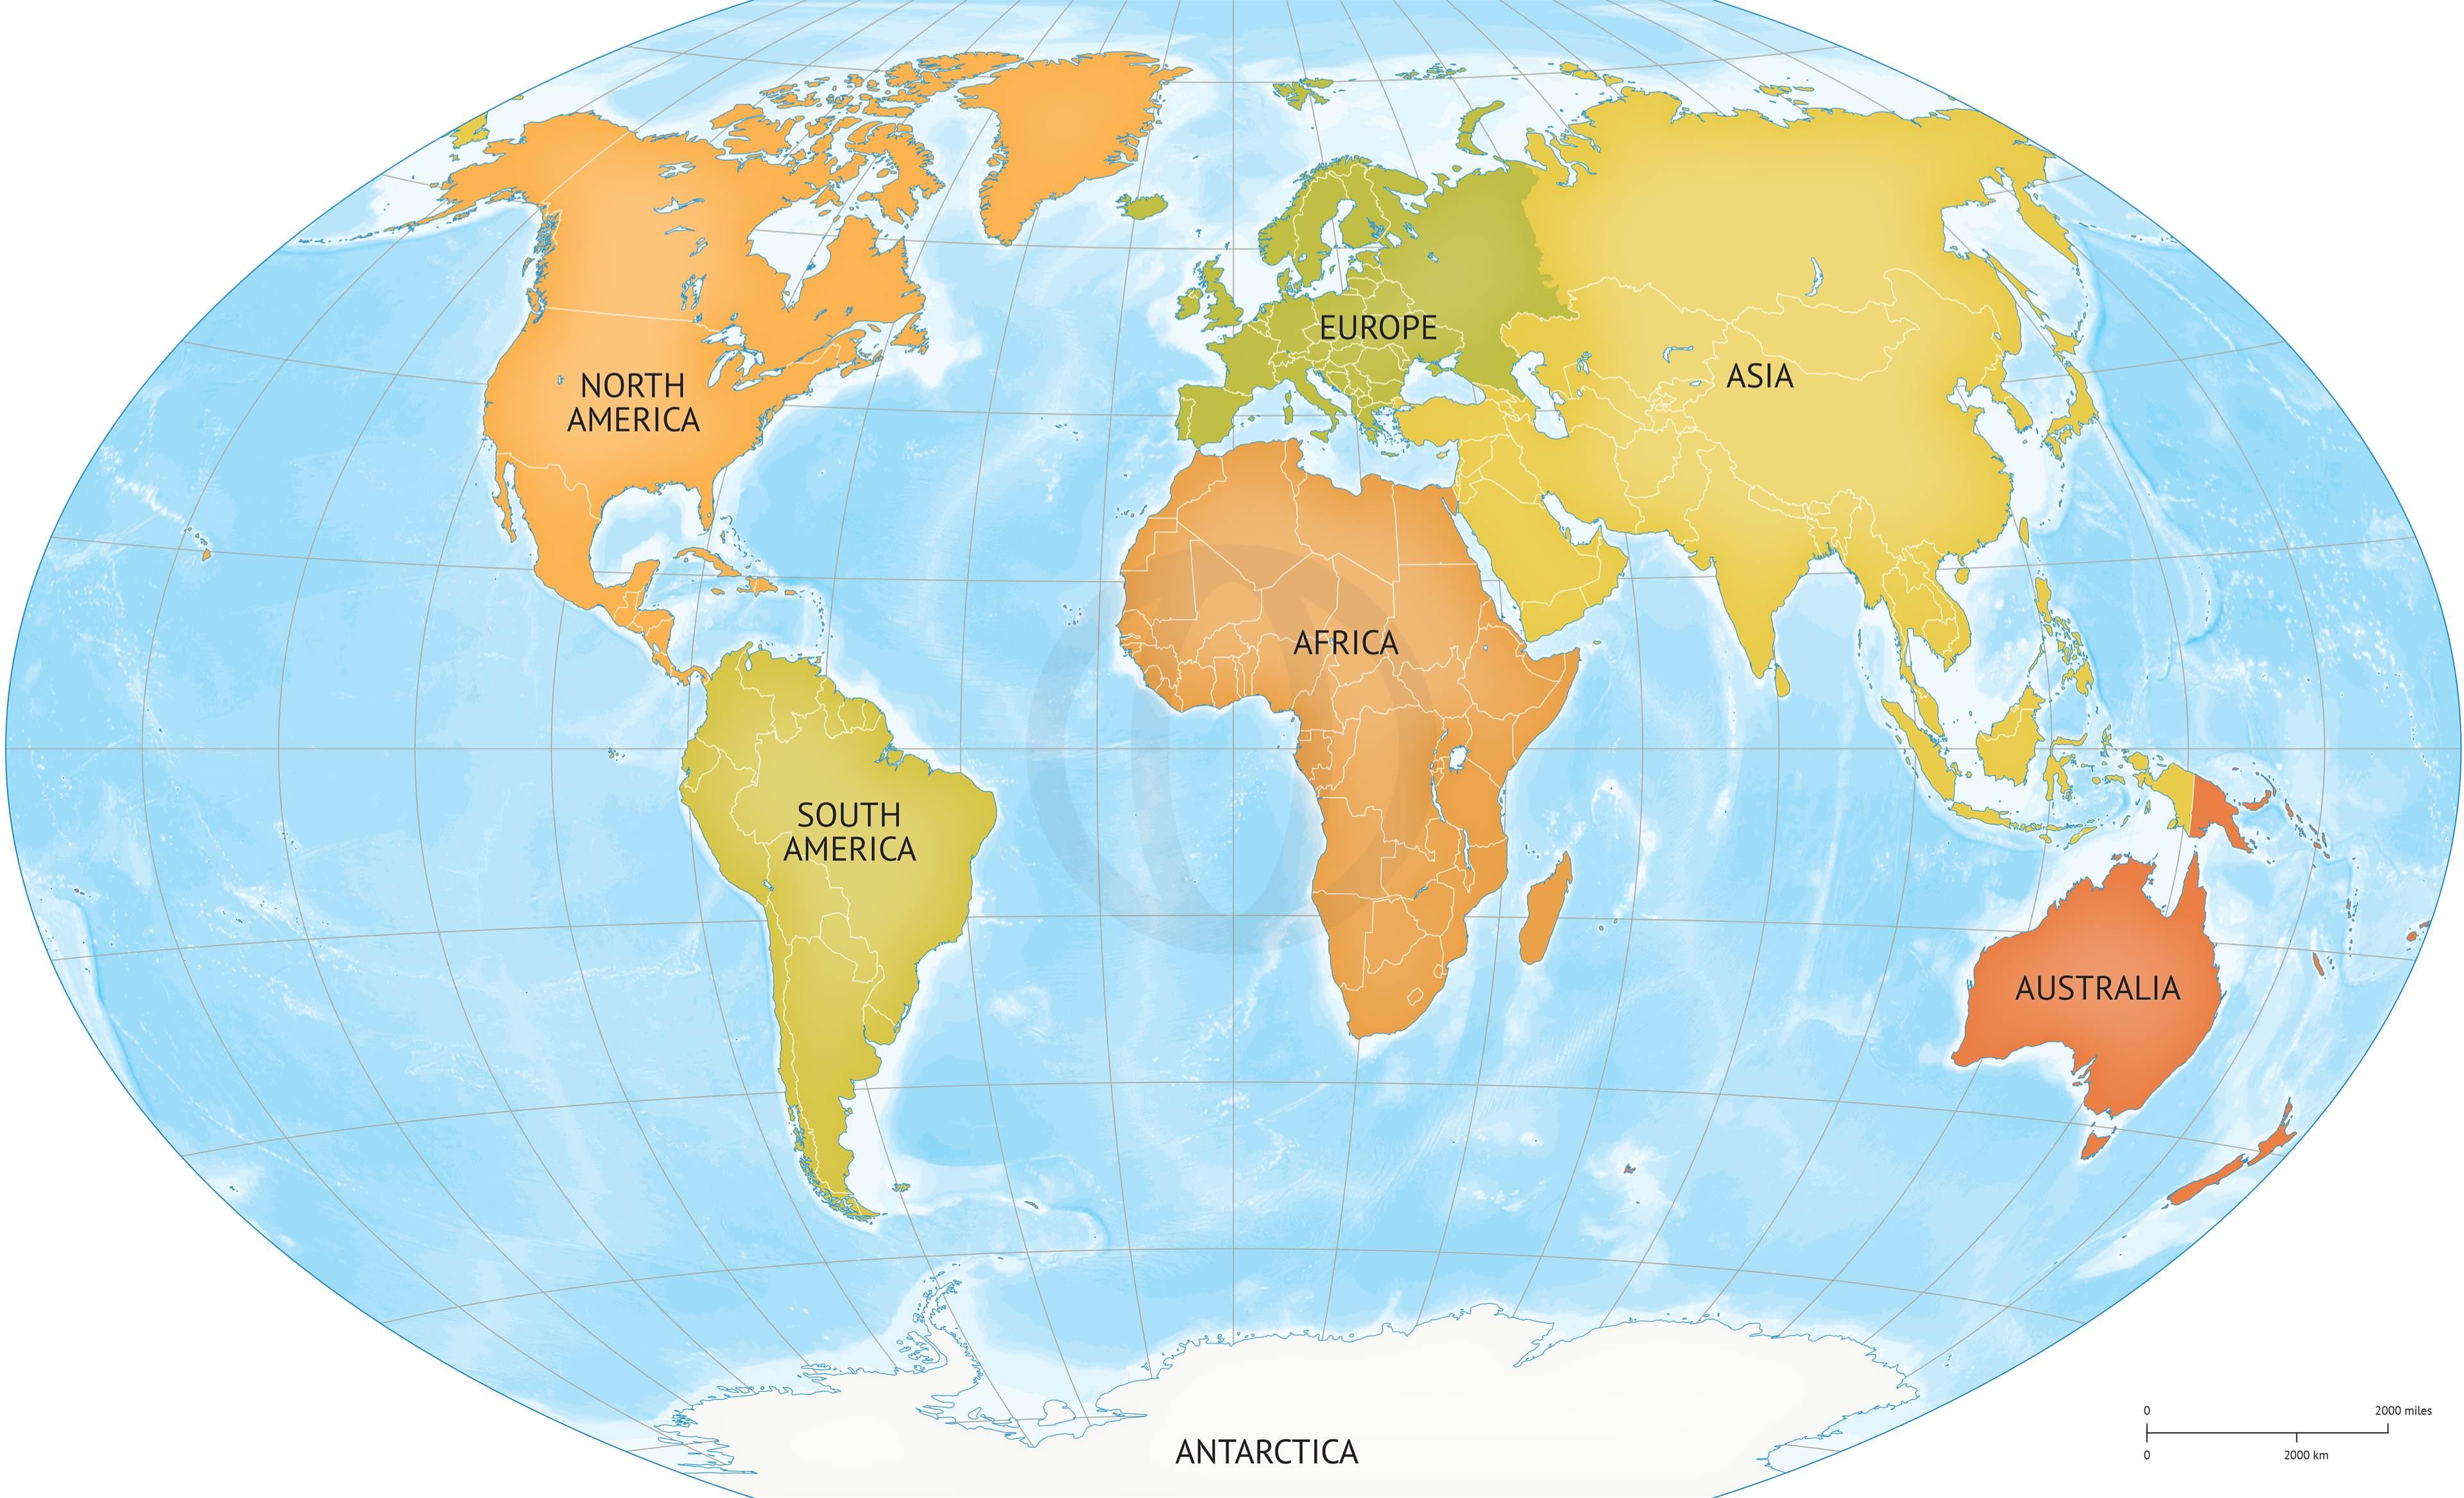 Maps Update 1280773 Dubai on Global Map Where is Dubai located – Dubai Map of the World